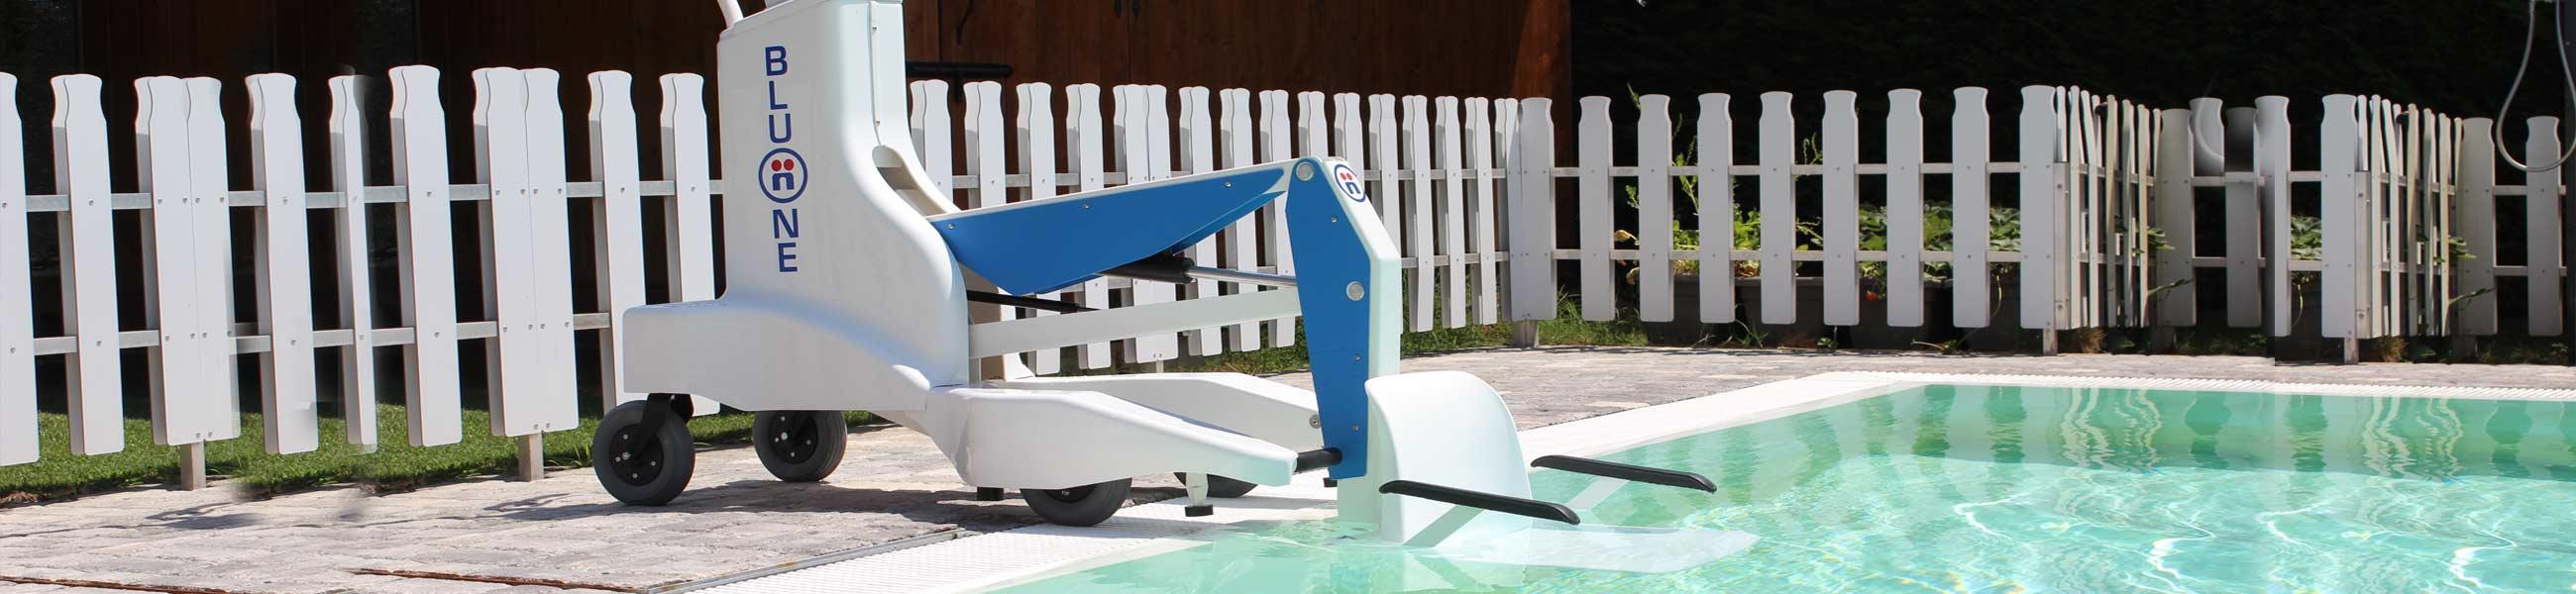 sollevatore mobile disabili piscina